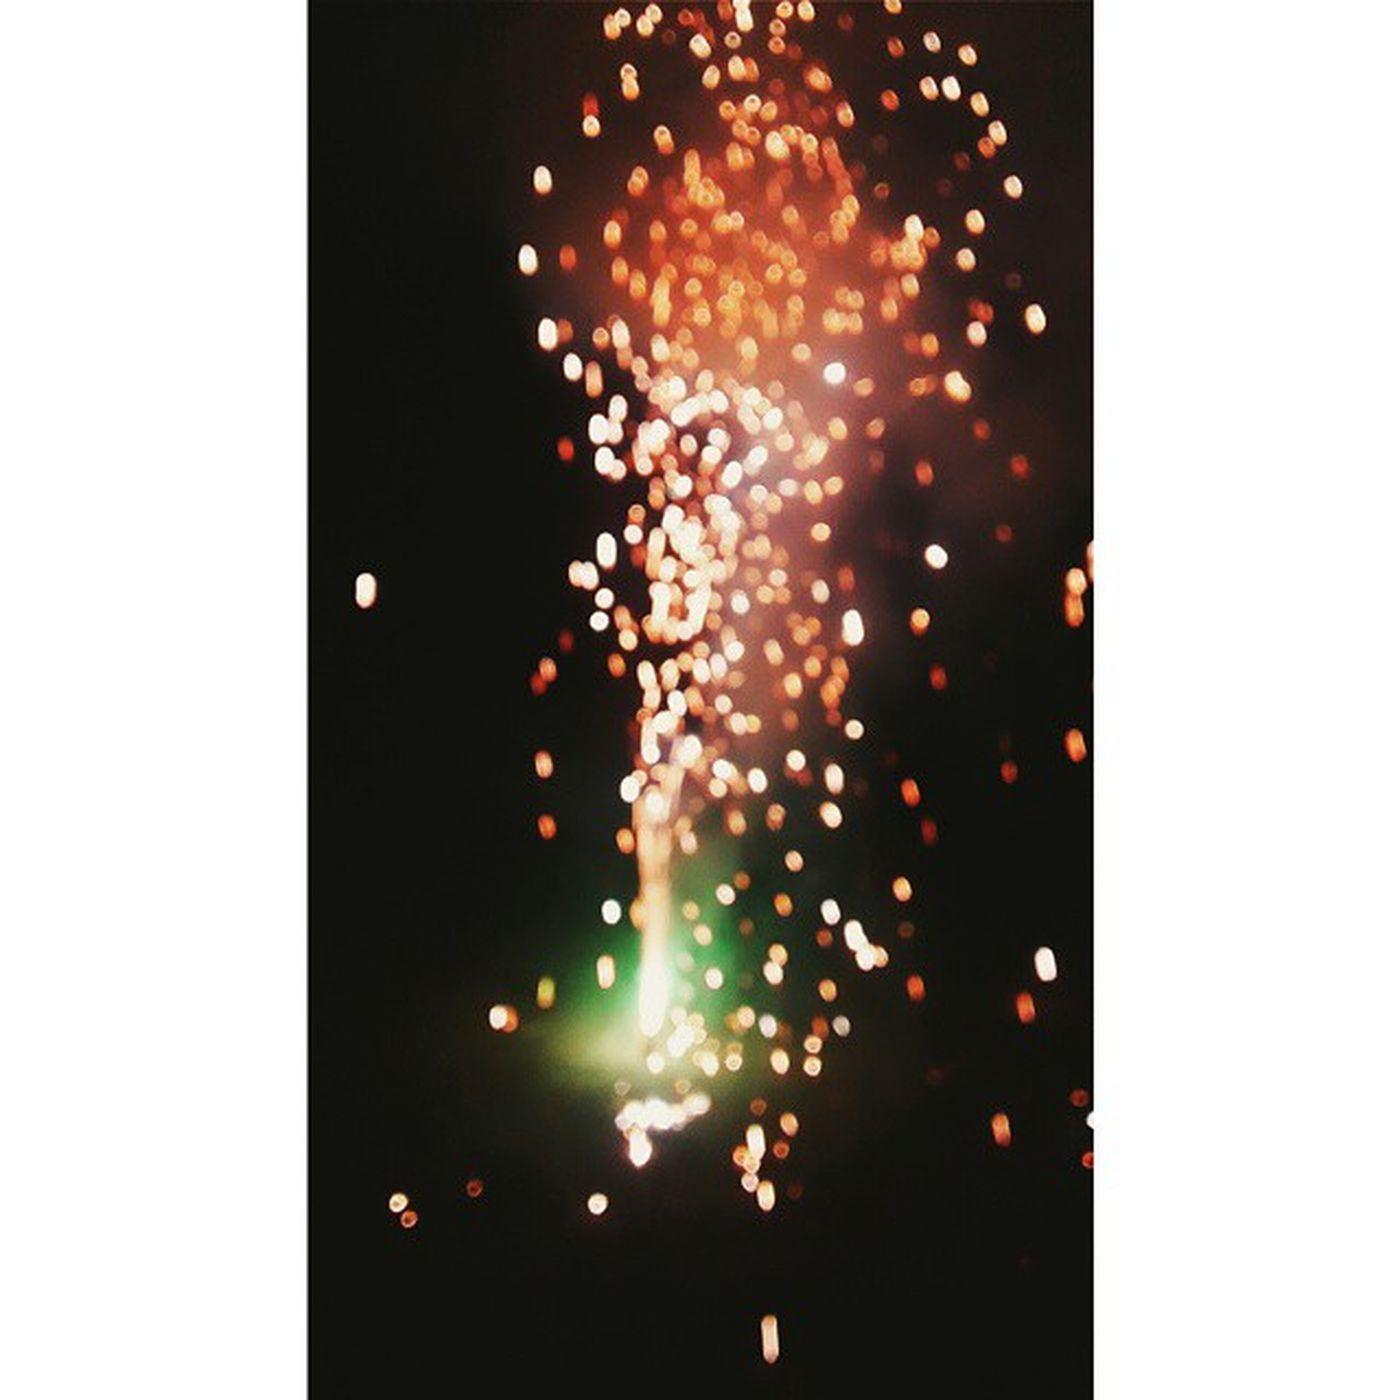 Happy Diwali Instagrammers..!!???? Happydiwali Instagtam DiwaliNights LightAndSound Crackerssomanycoloursvscogridvscolovevscoindiavscosocietyvscocamigerspictureperfectblurhappypeoplesempiternal.